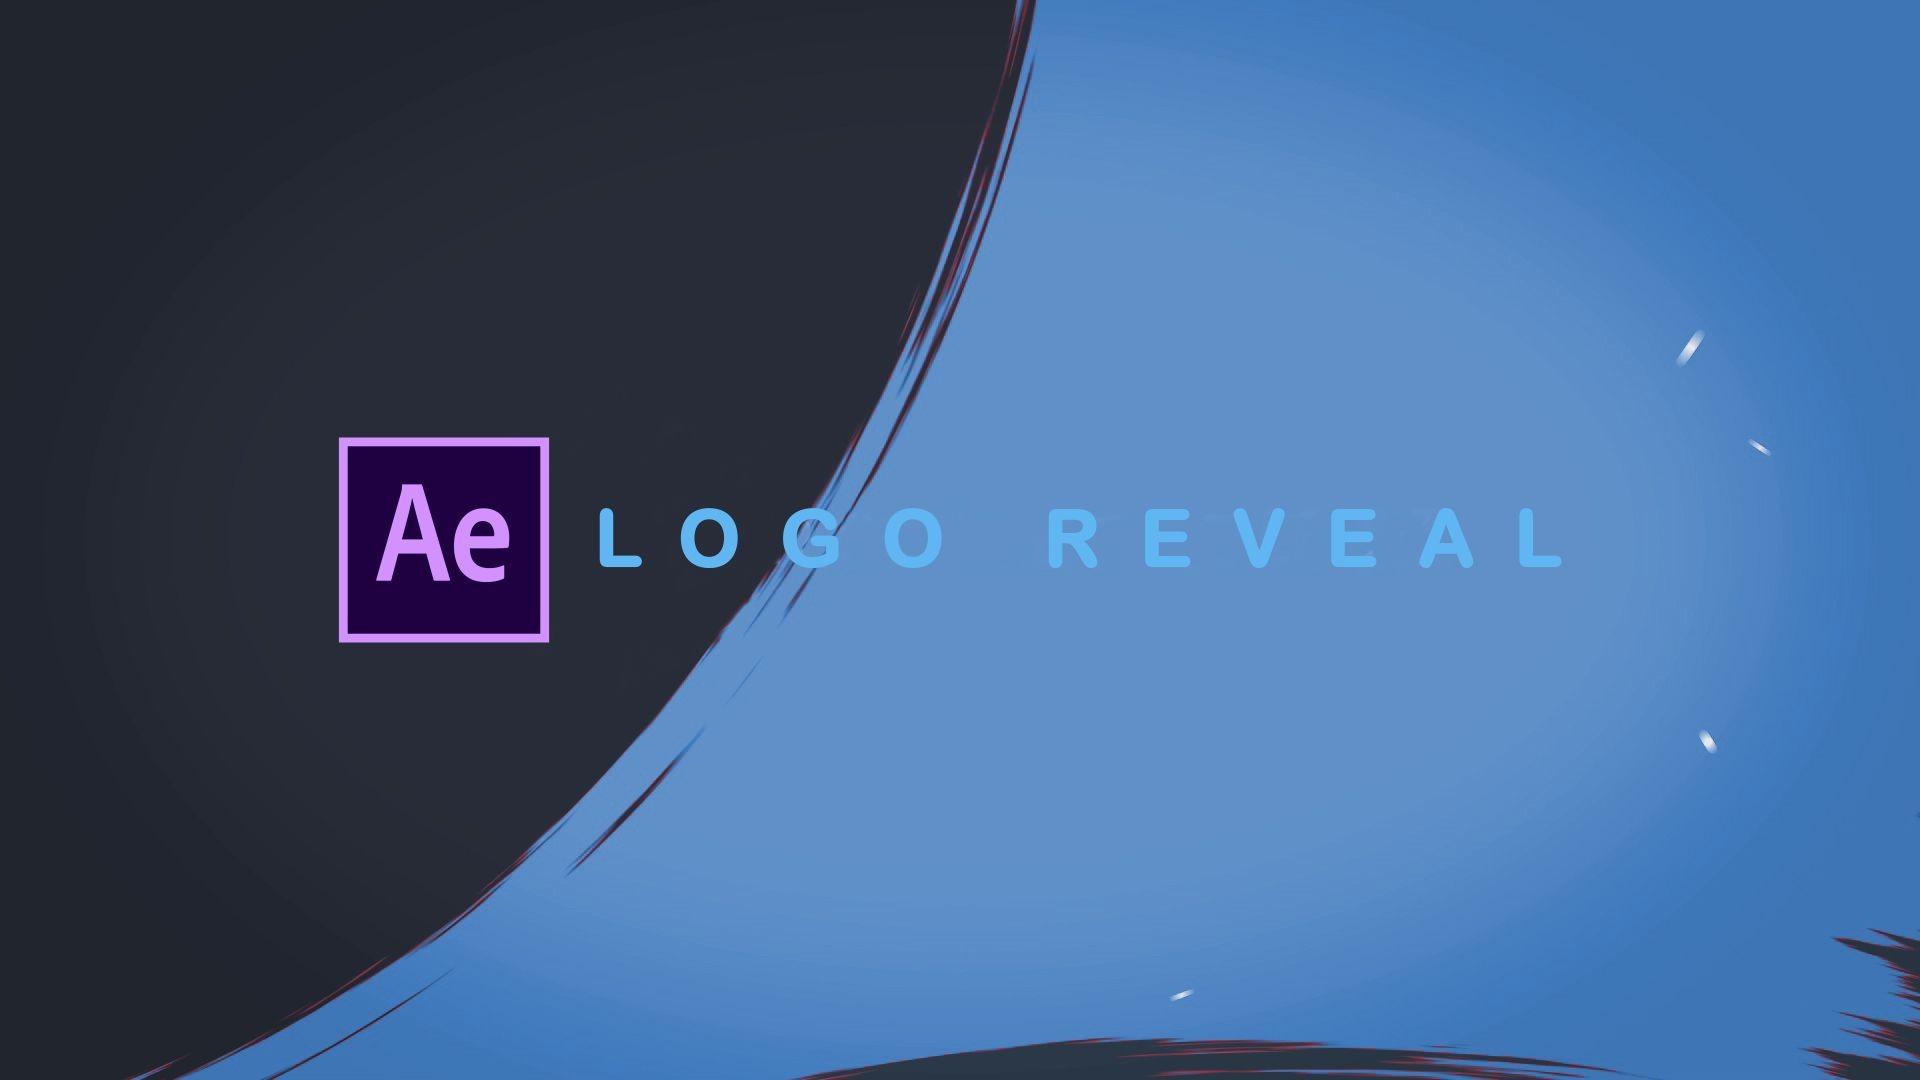 006 Shocking Adobe After Effect Logo Template Free Download Sample  Cs6 Wedding Invitation Cs5 Intro1920